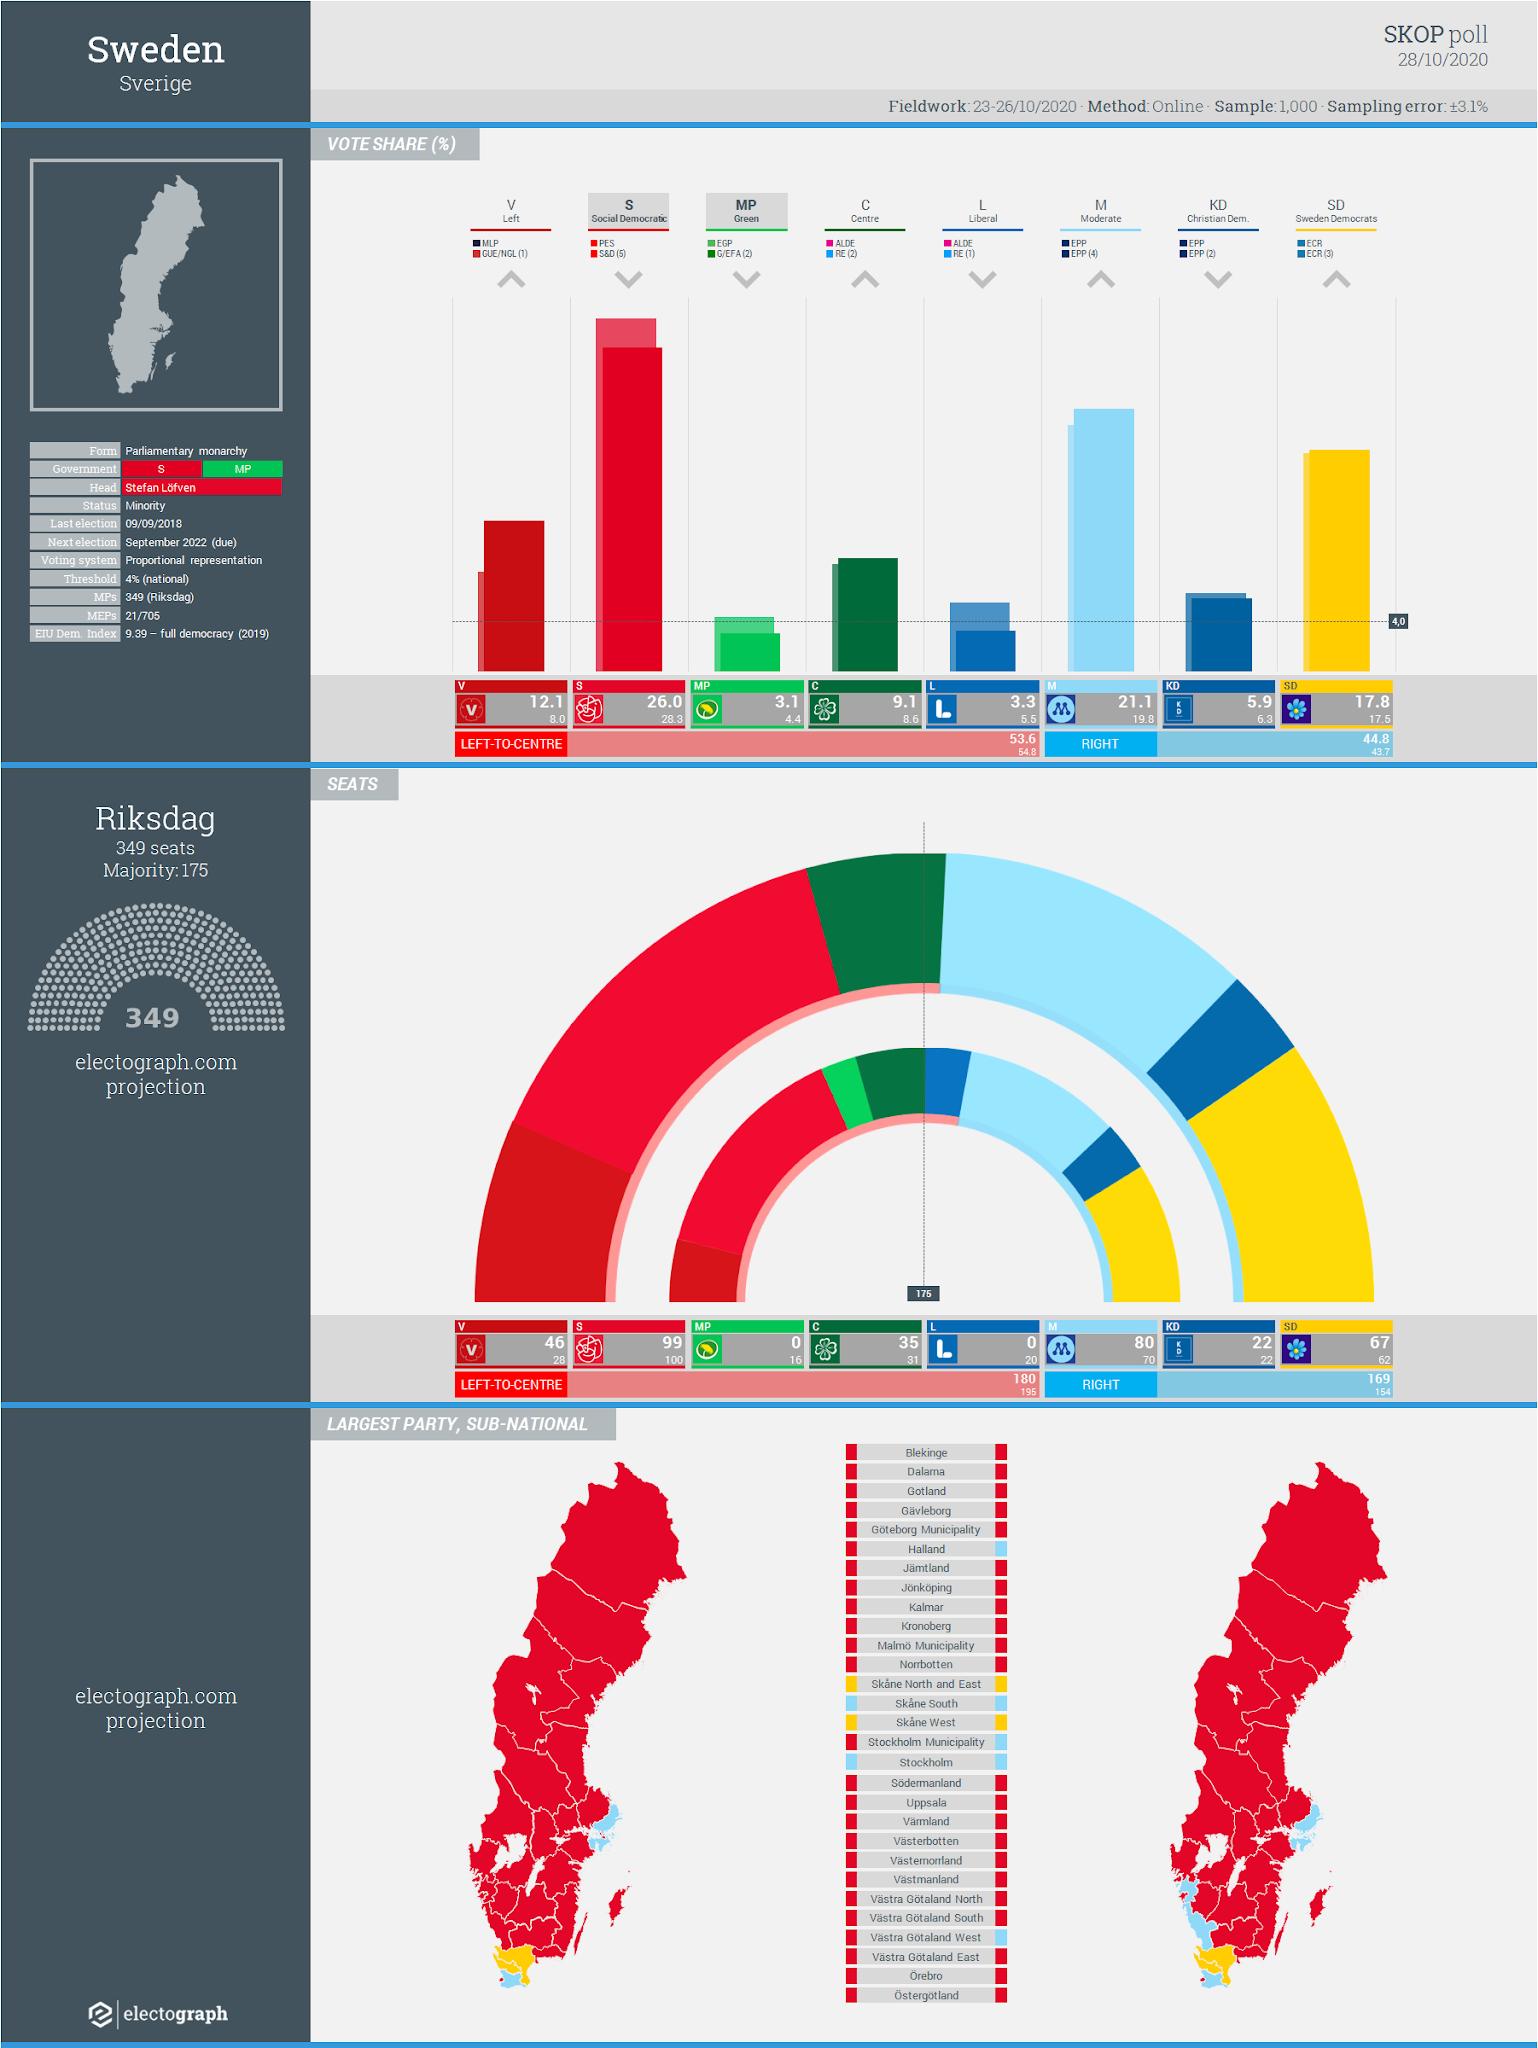 SWEDEN: Skop poll chart, 28 October 2020